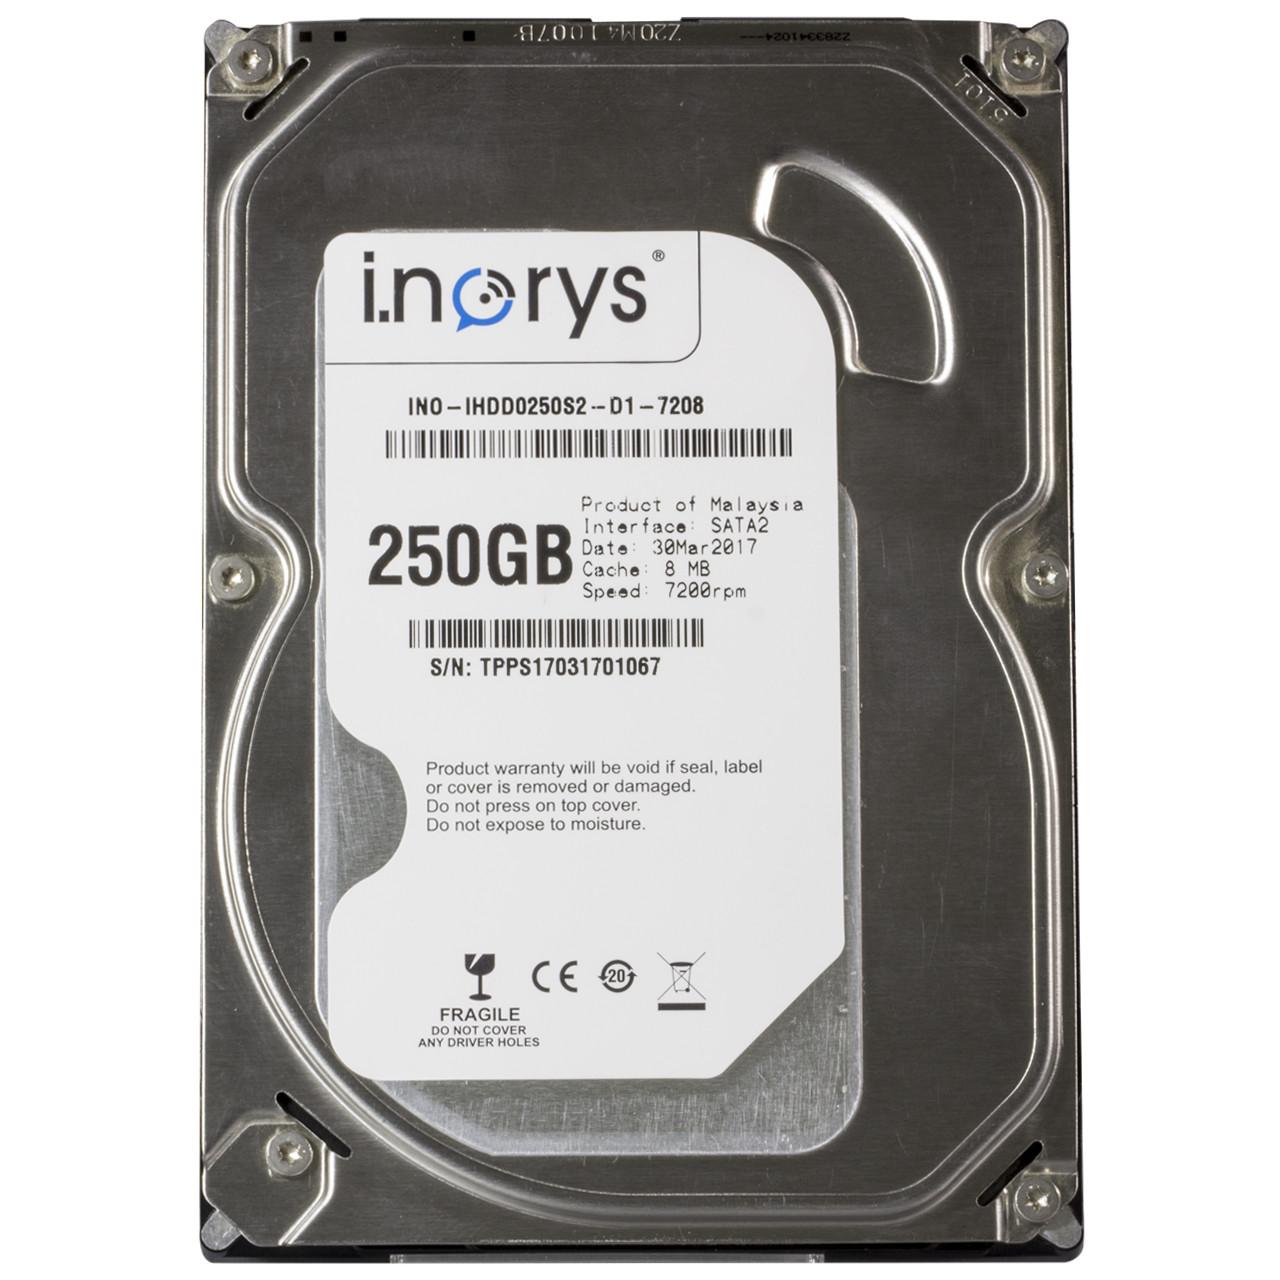 Жесткий диск i.norys 250 GB 7200 rpm 8 MB (INO-IHDD0250S2-D1-7208) HDD SATA для компьютера носитель винчестер